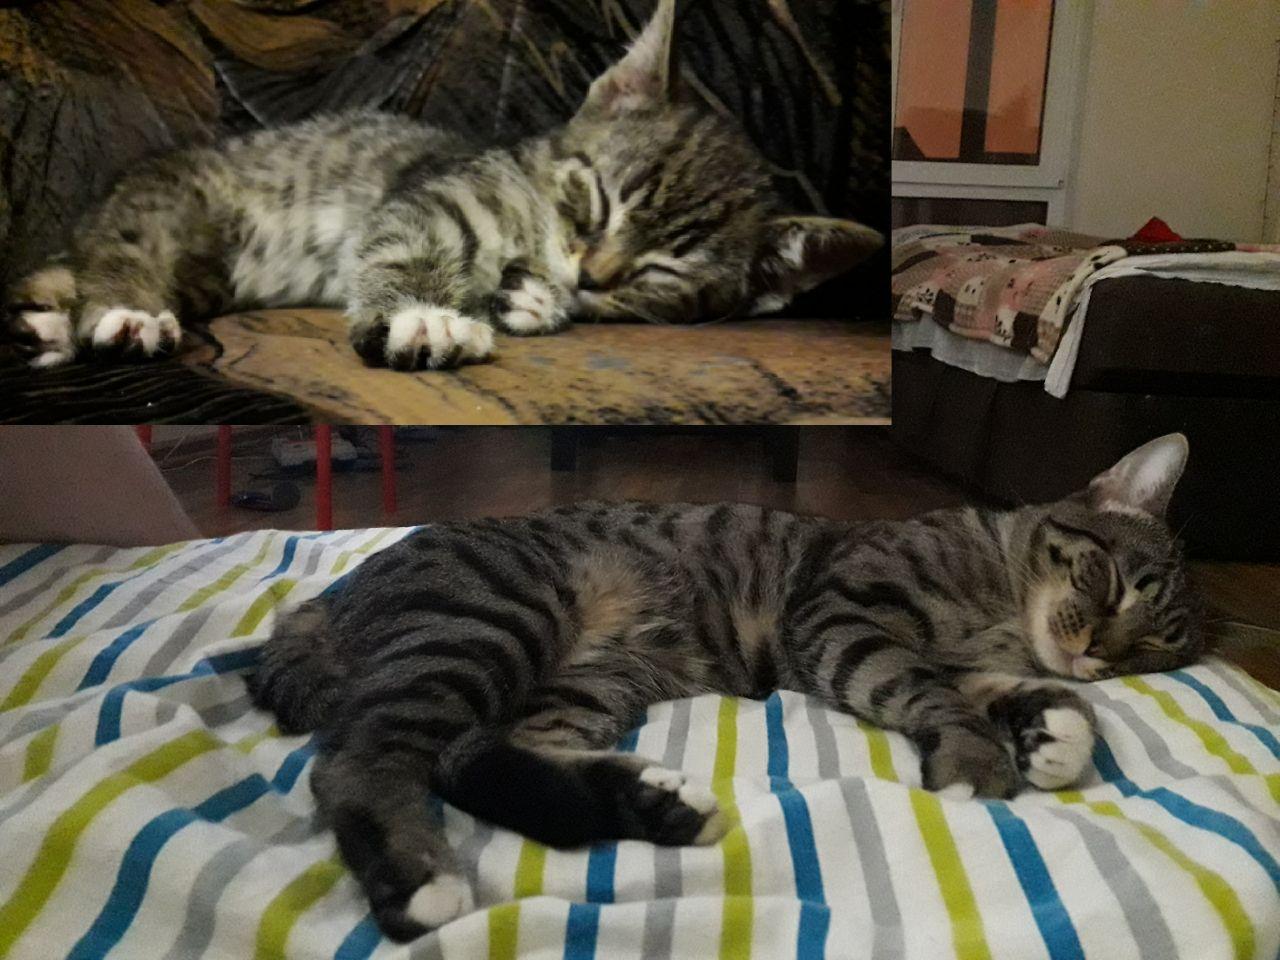 С котом в доме теплее и веселее